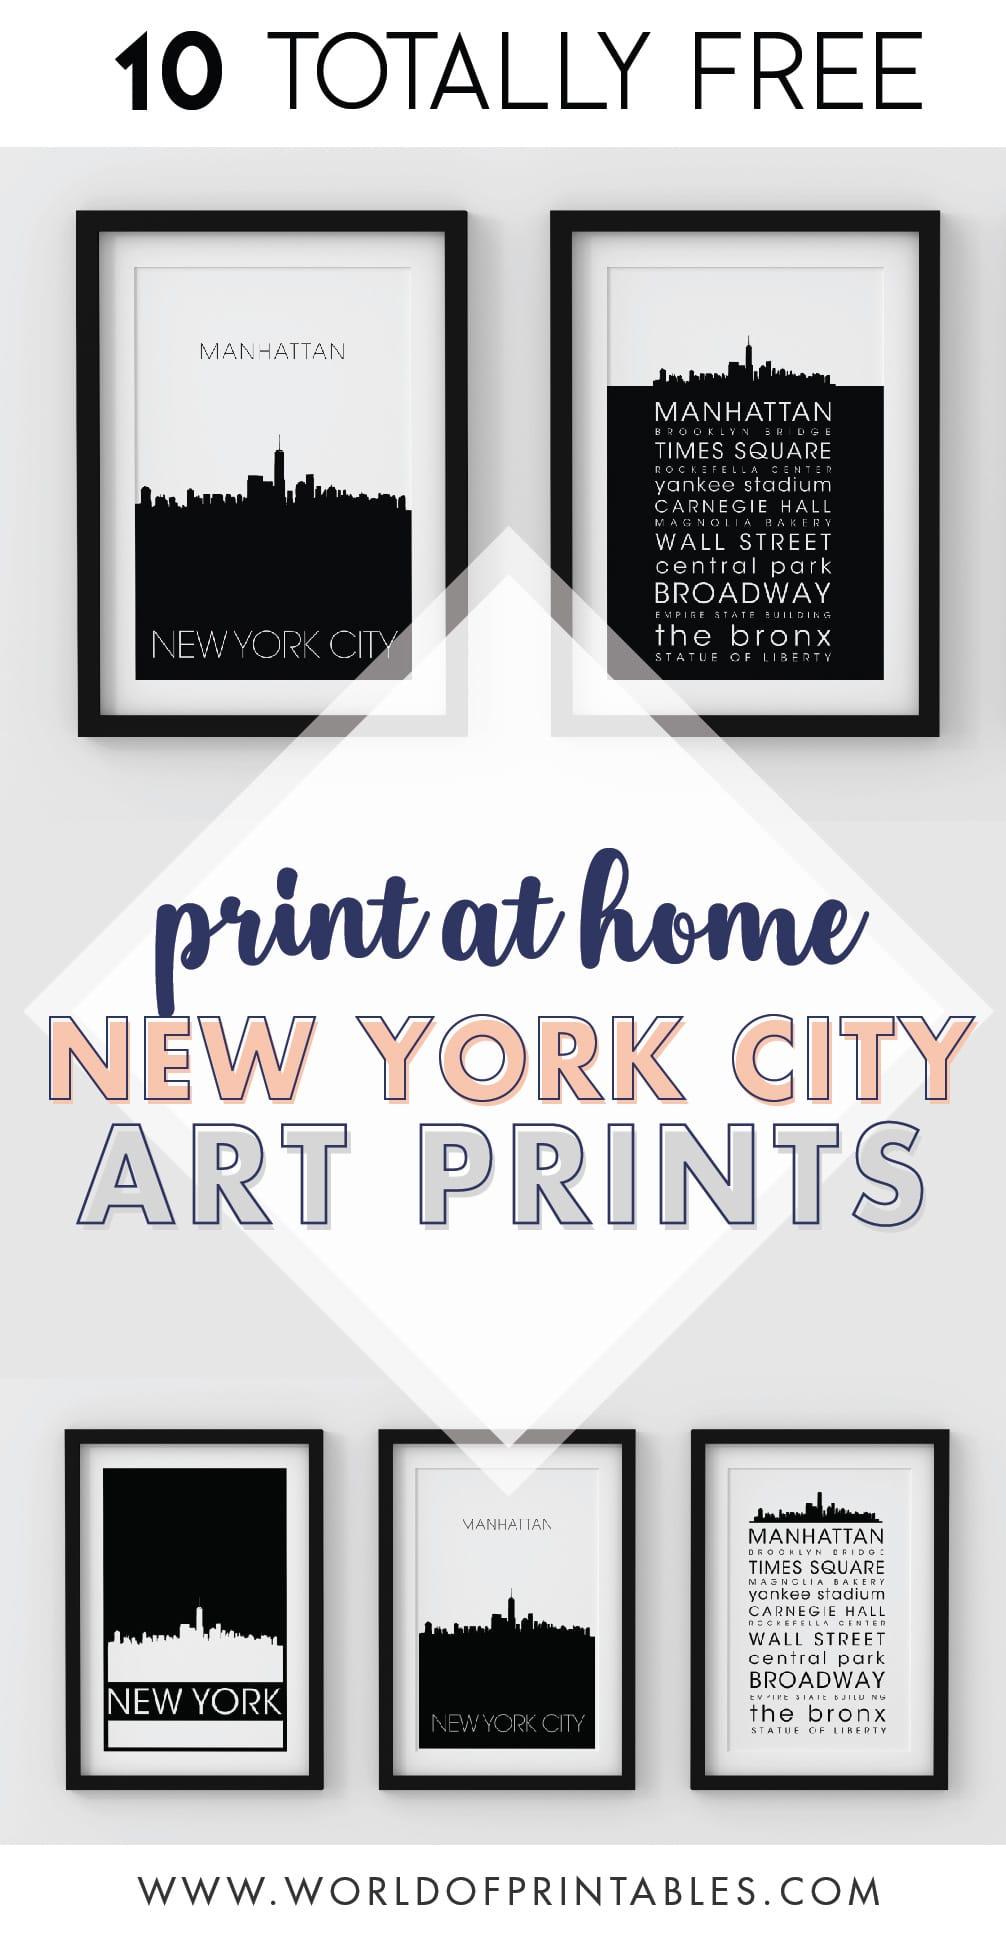 10-Totally-Free-New-York-City-Wall-Art-Prints-home-decor-ideas